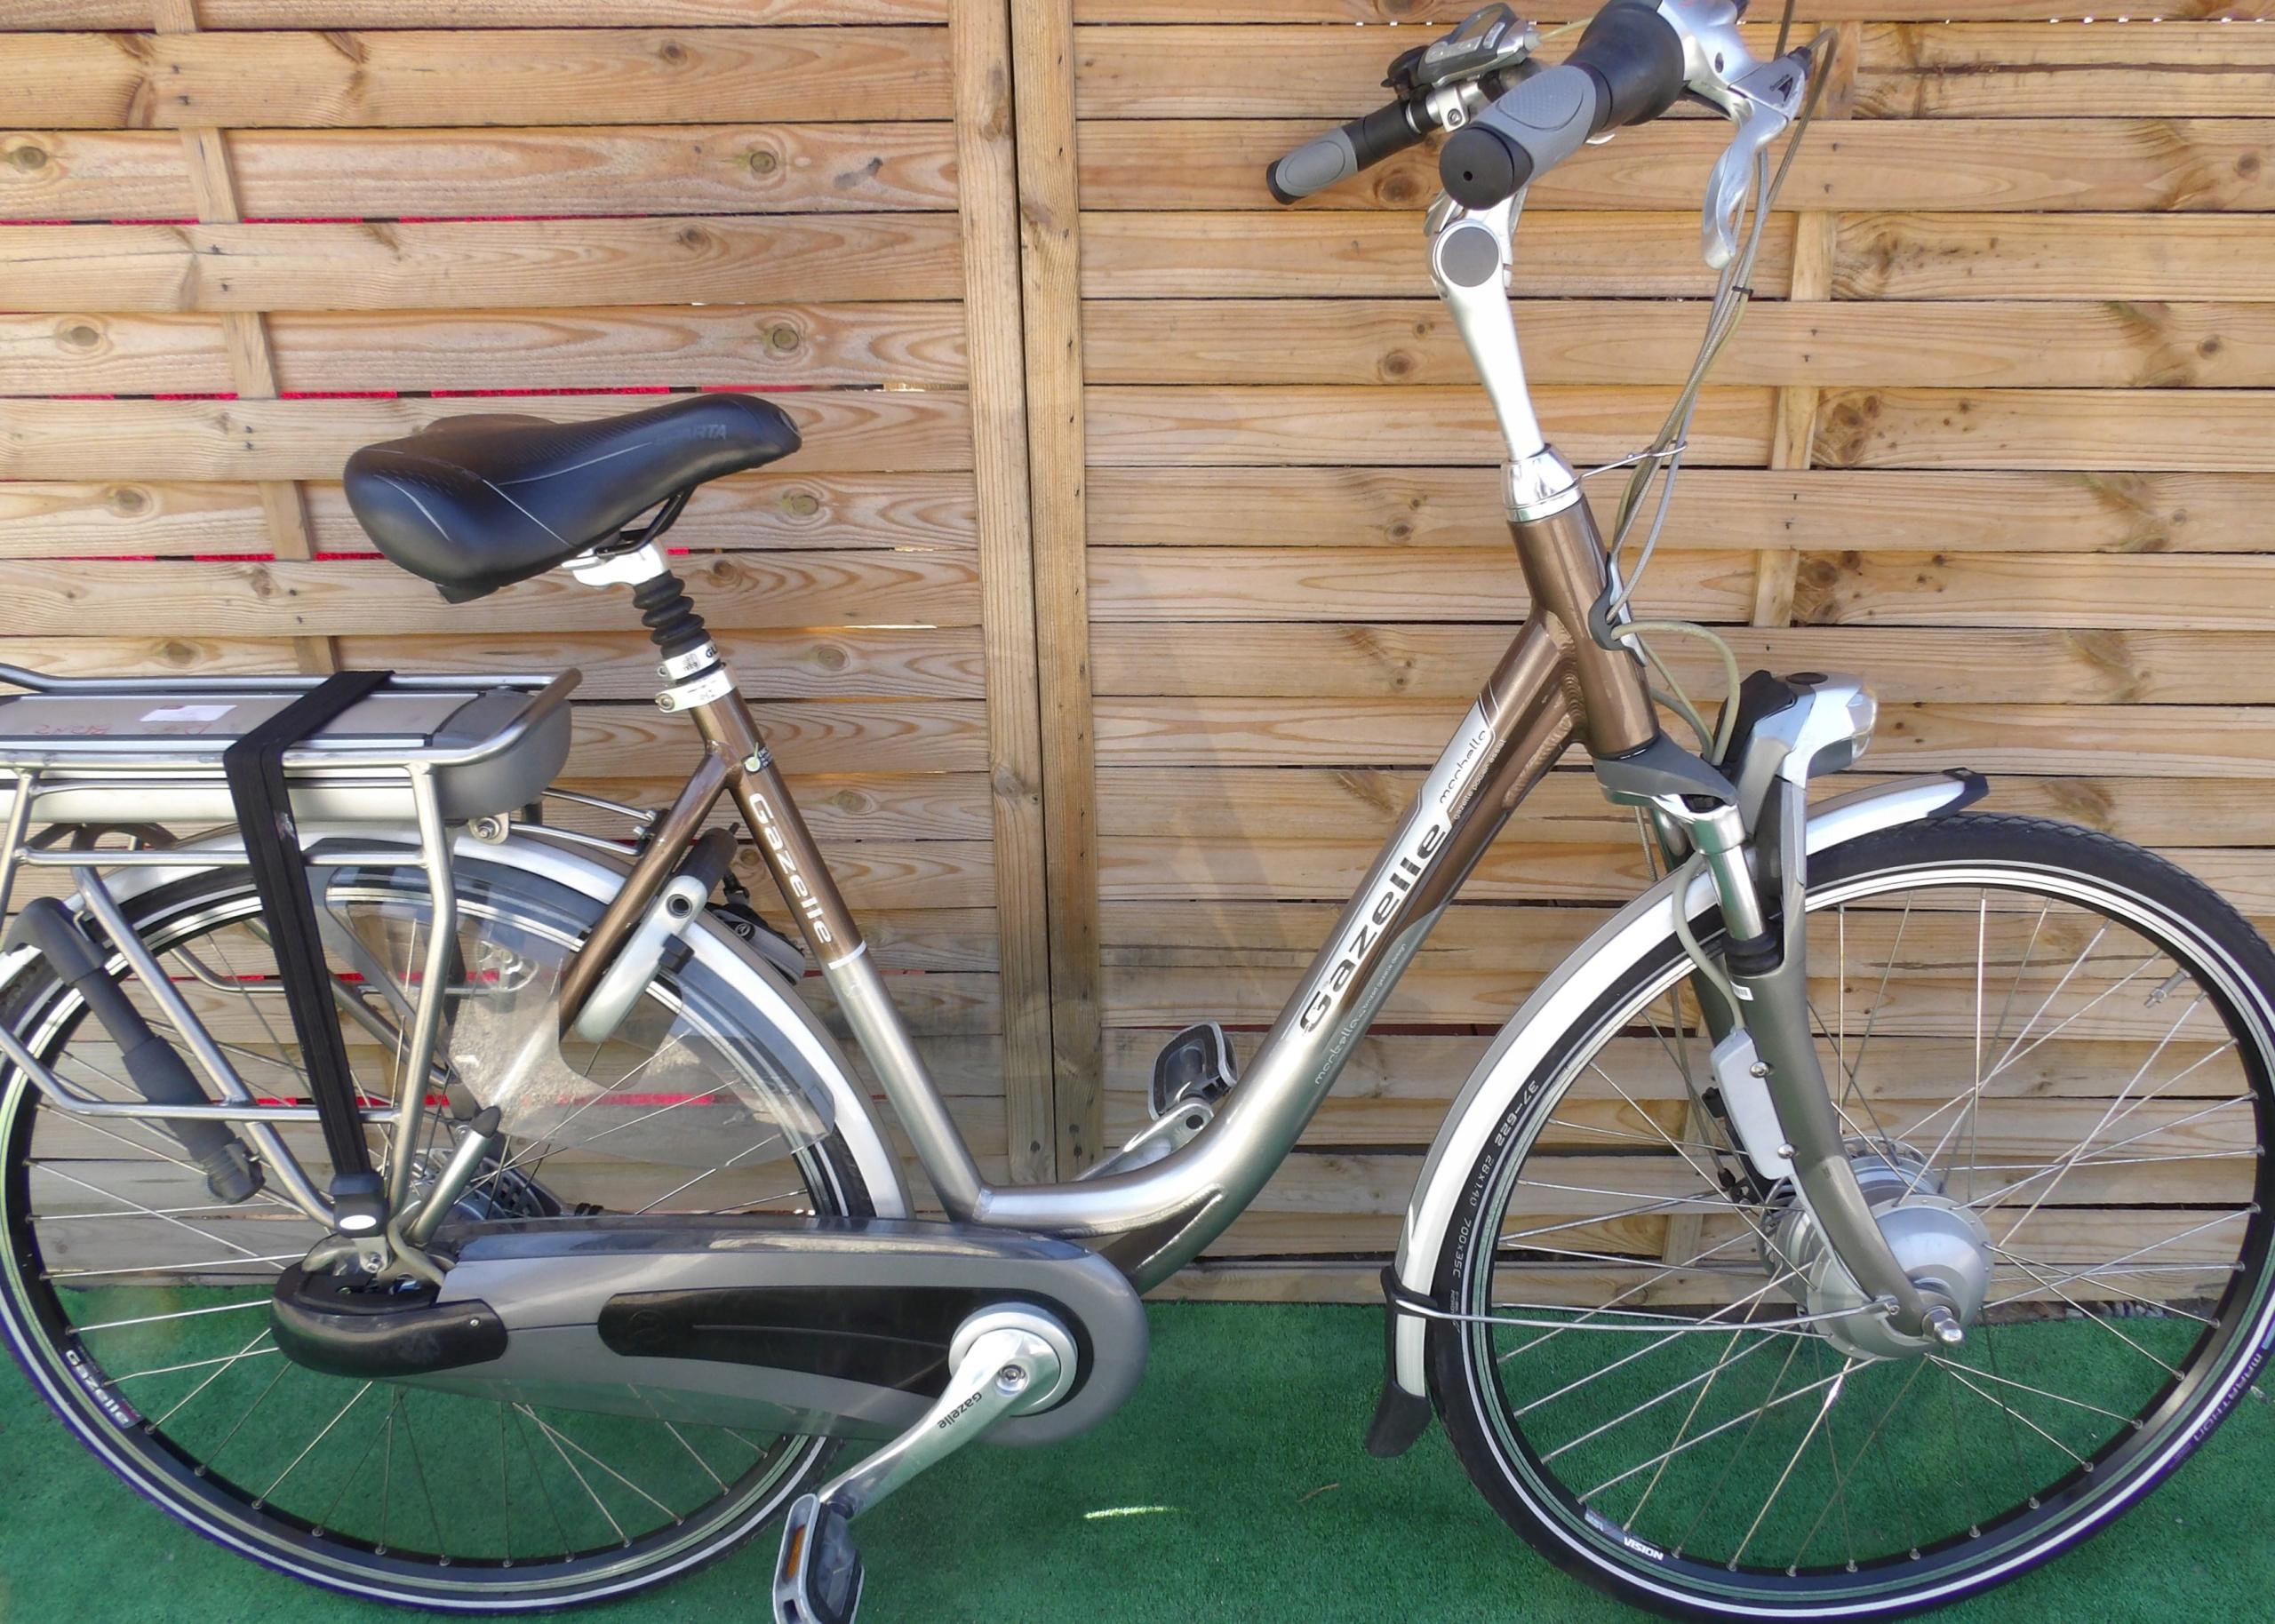 Rower elektryczny Gazelle Marbella. D 53. I inne.